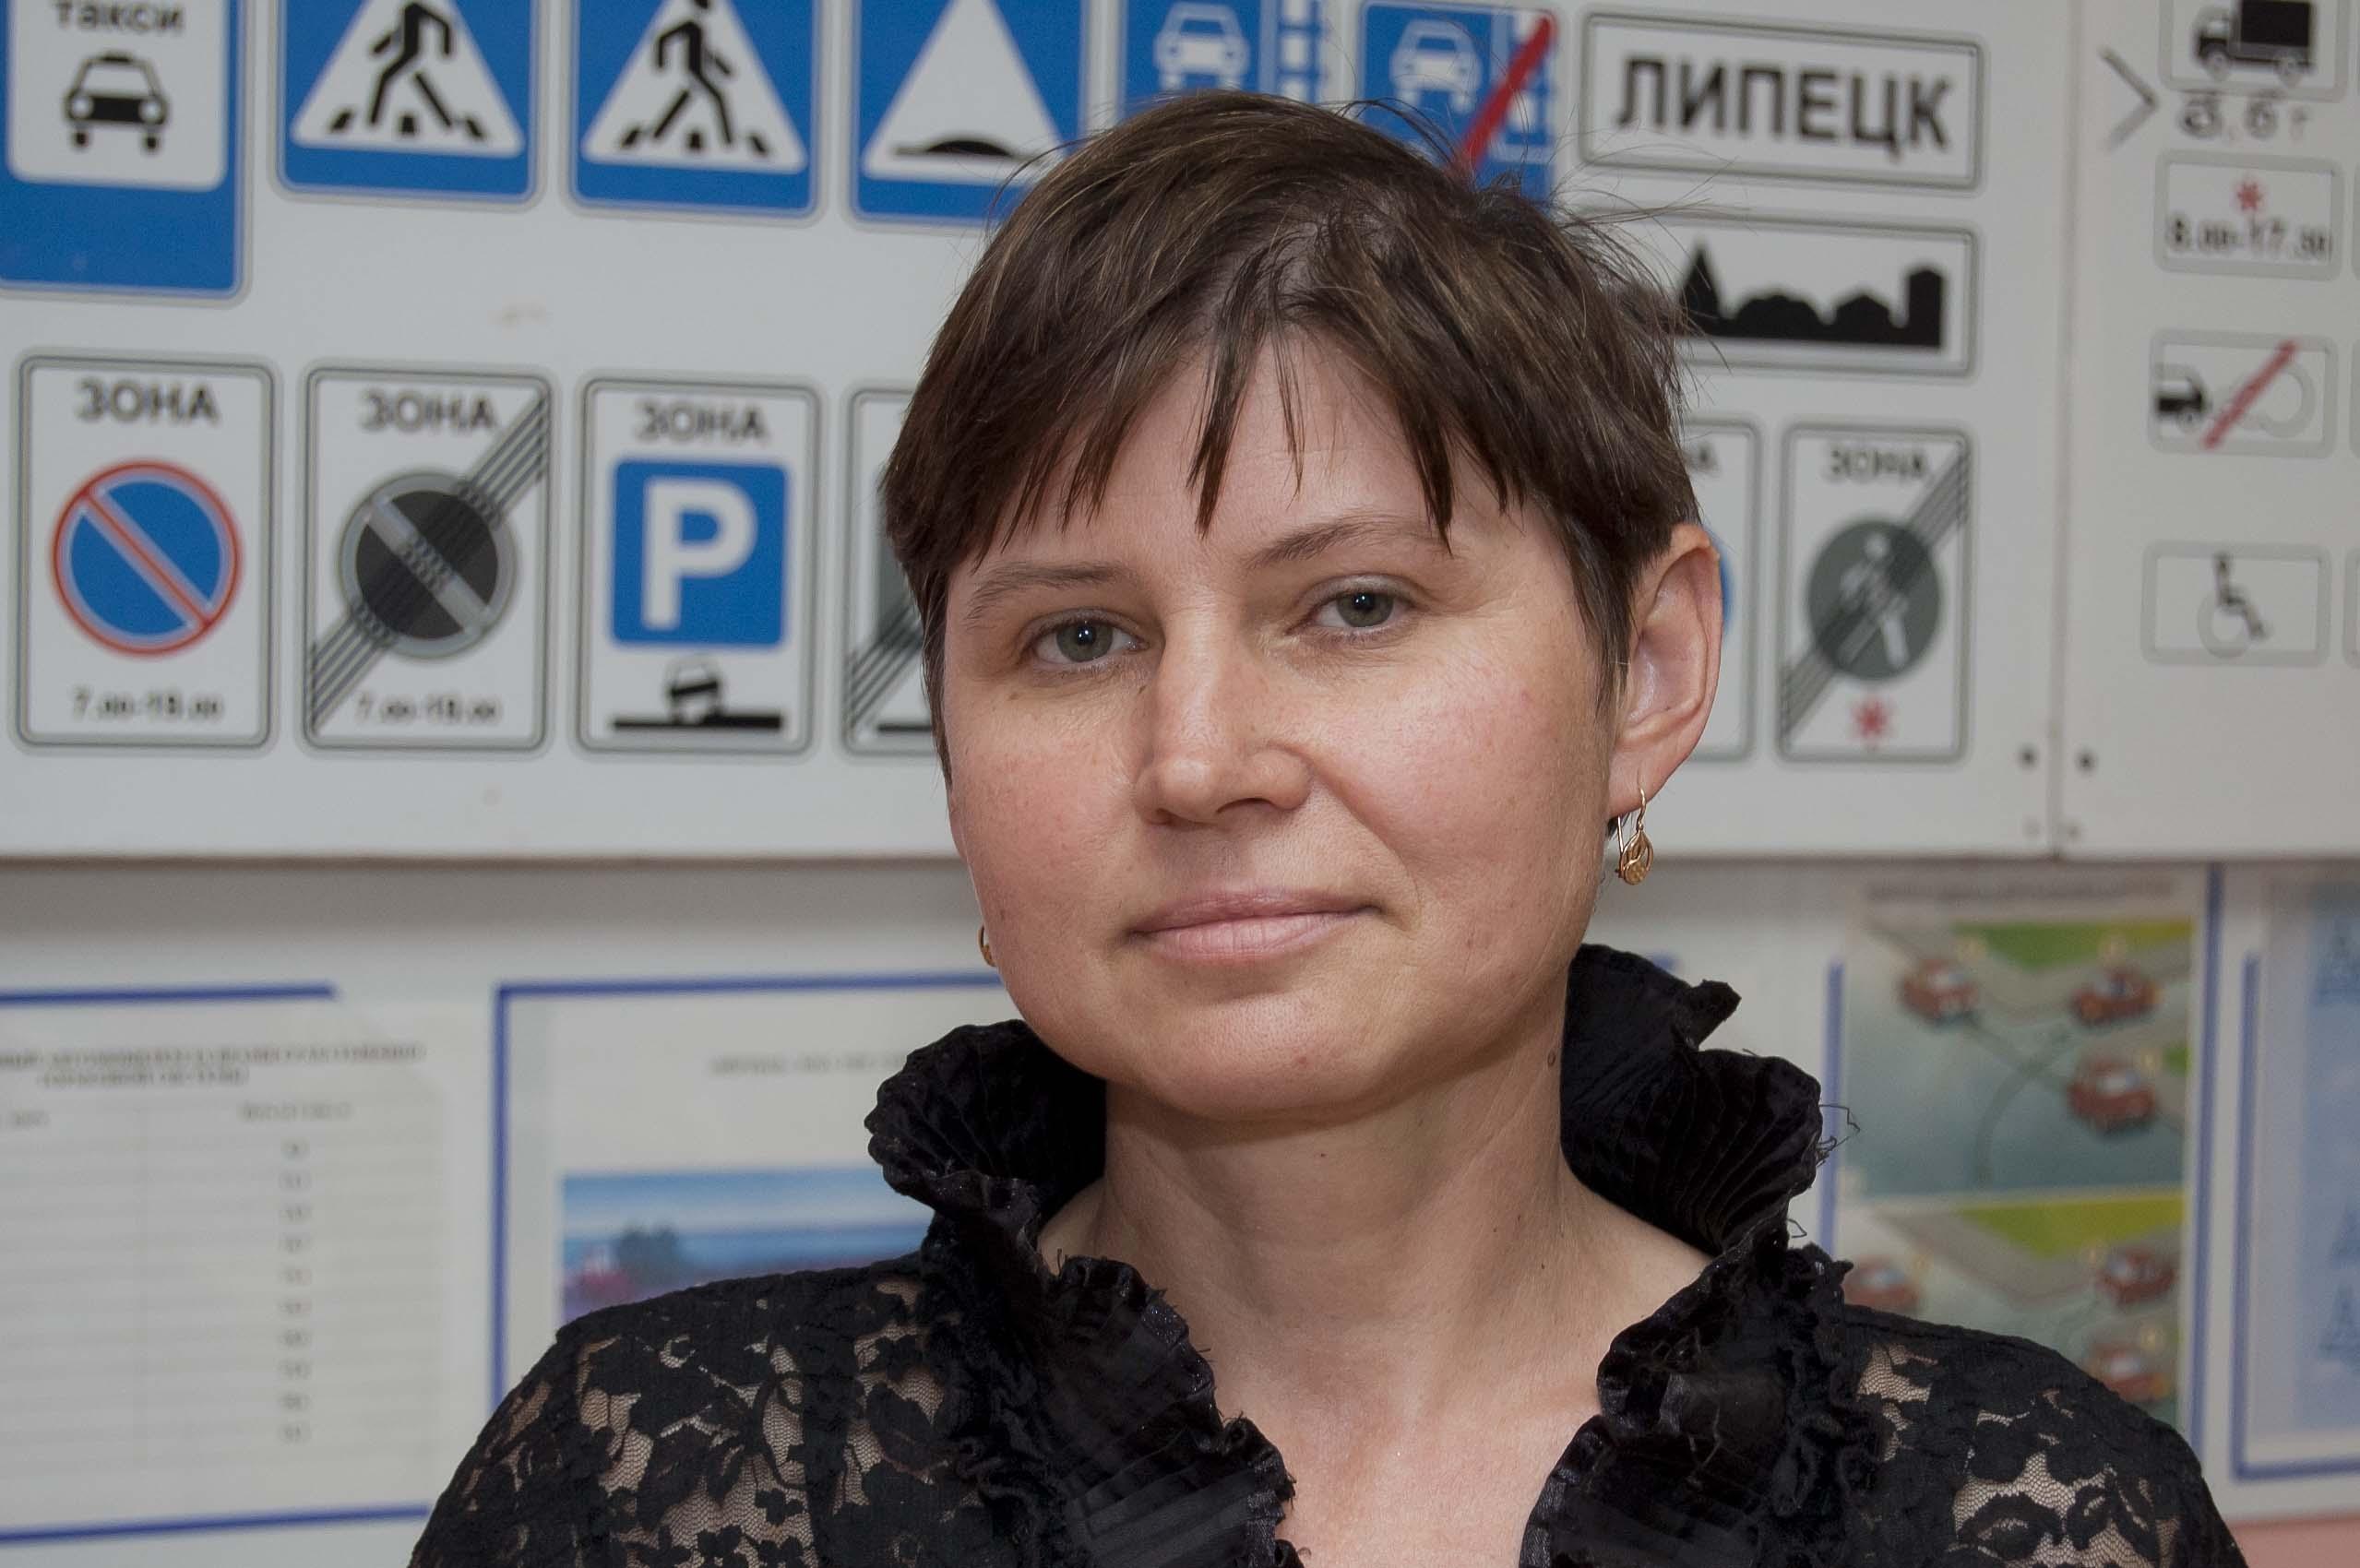 Тараканова татьяна анатольевна, Татьяна Анатольевна Тараканова(Сыченикова) 13 фотография